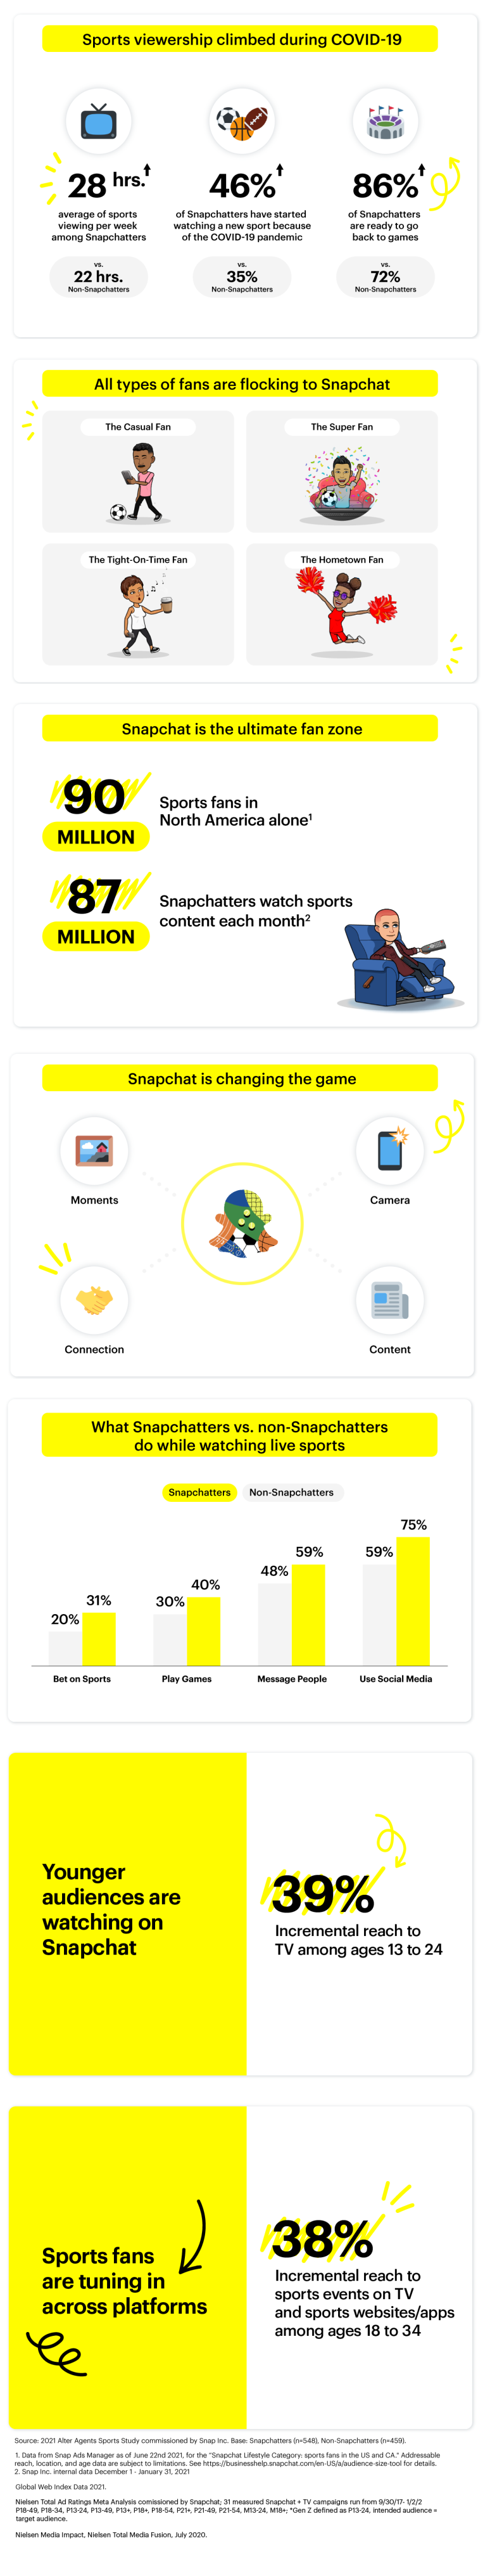 Snapchat sports engagement stats